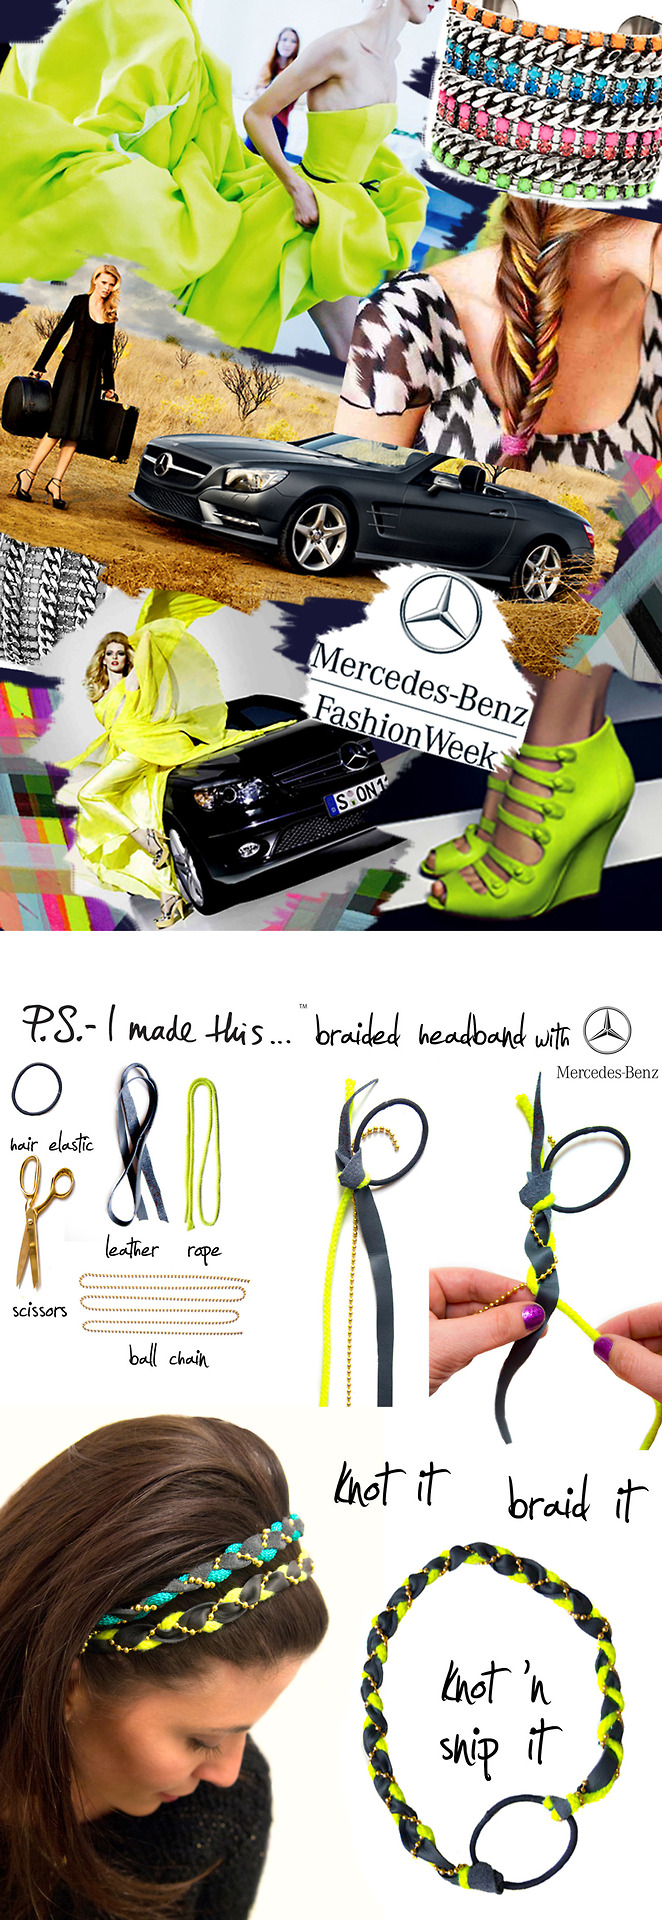 02.06.12_braided headband